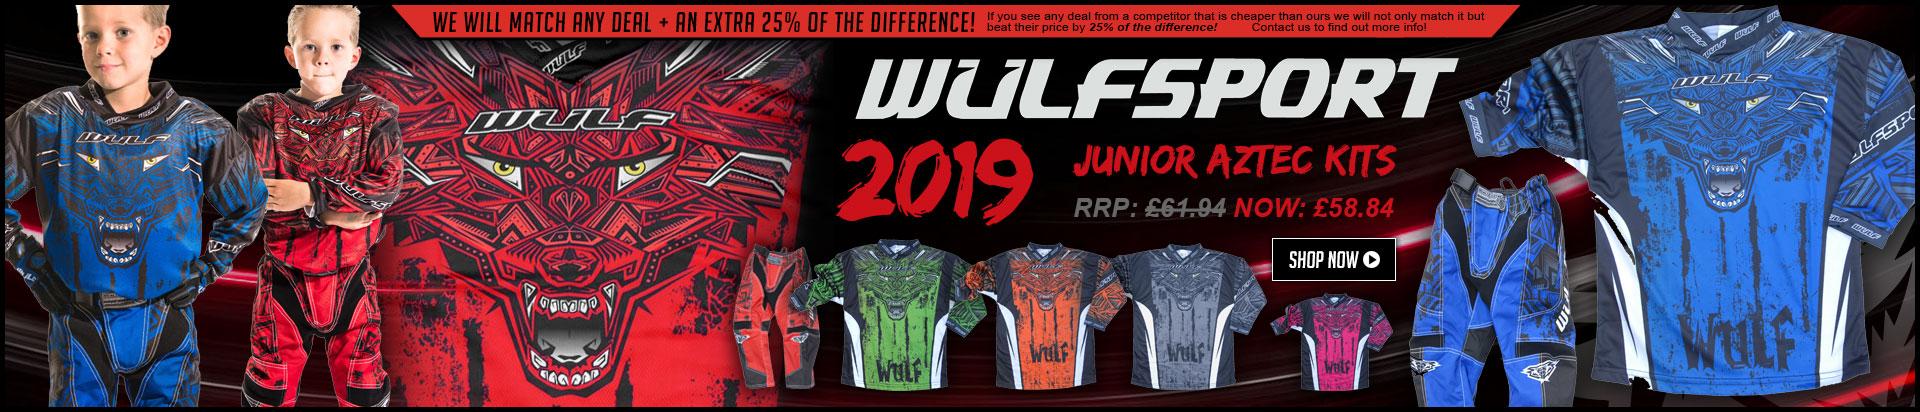 Wulf Aztec Kits